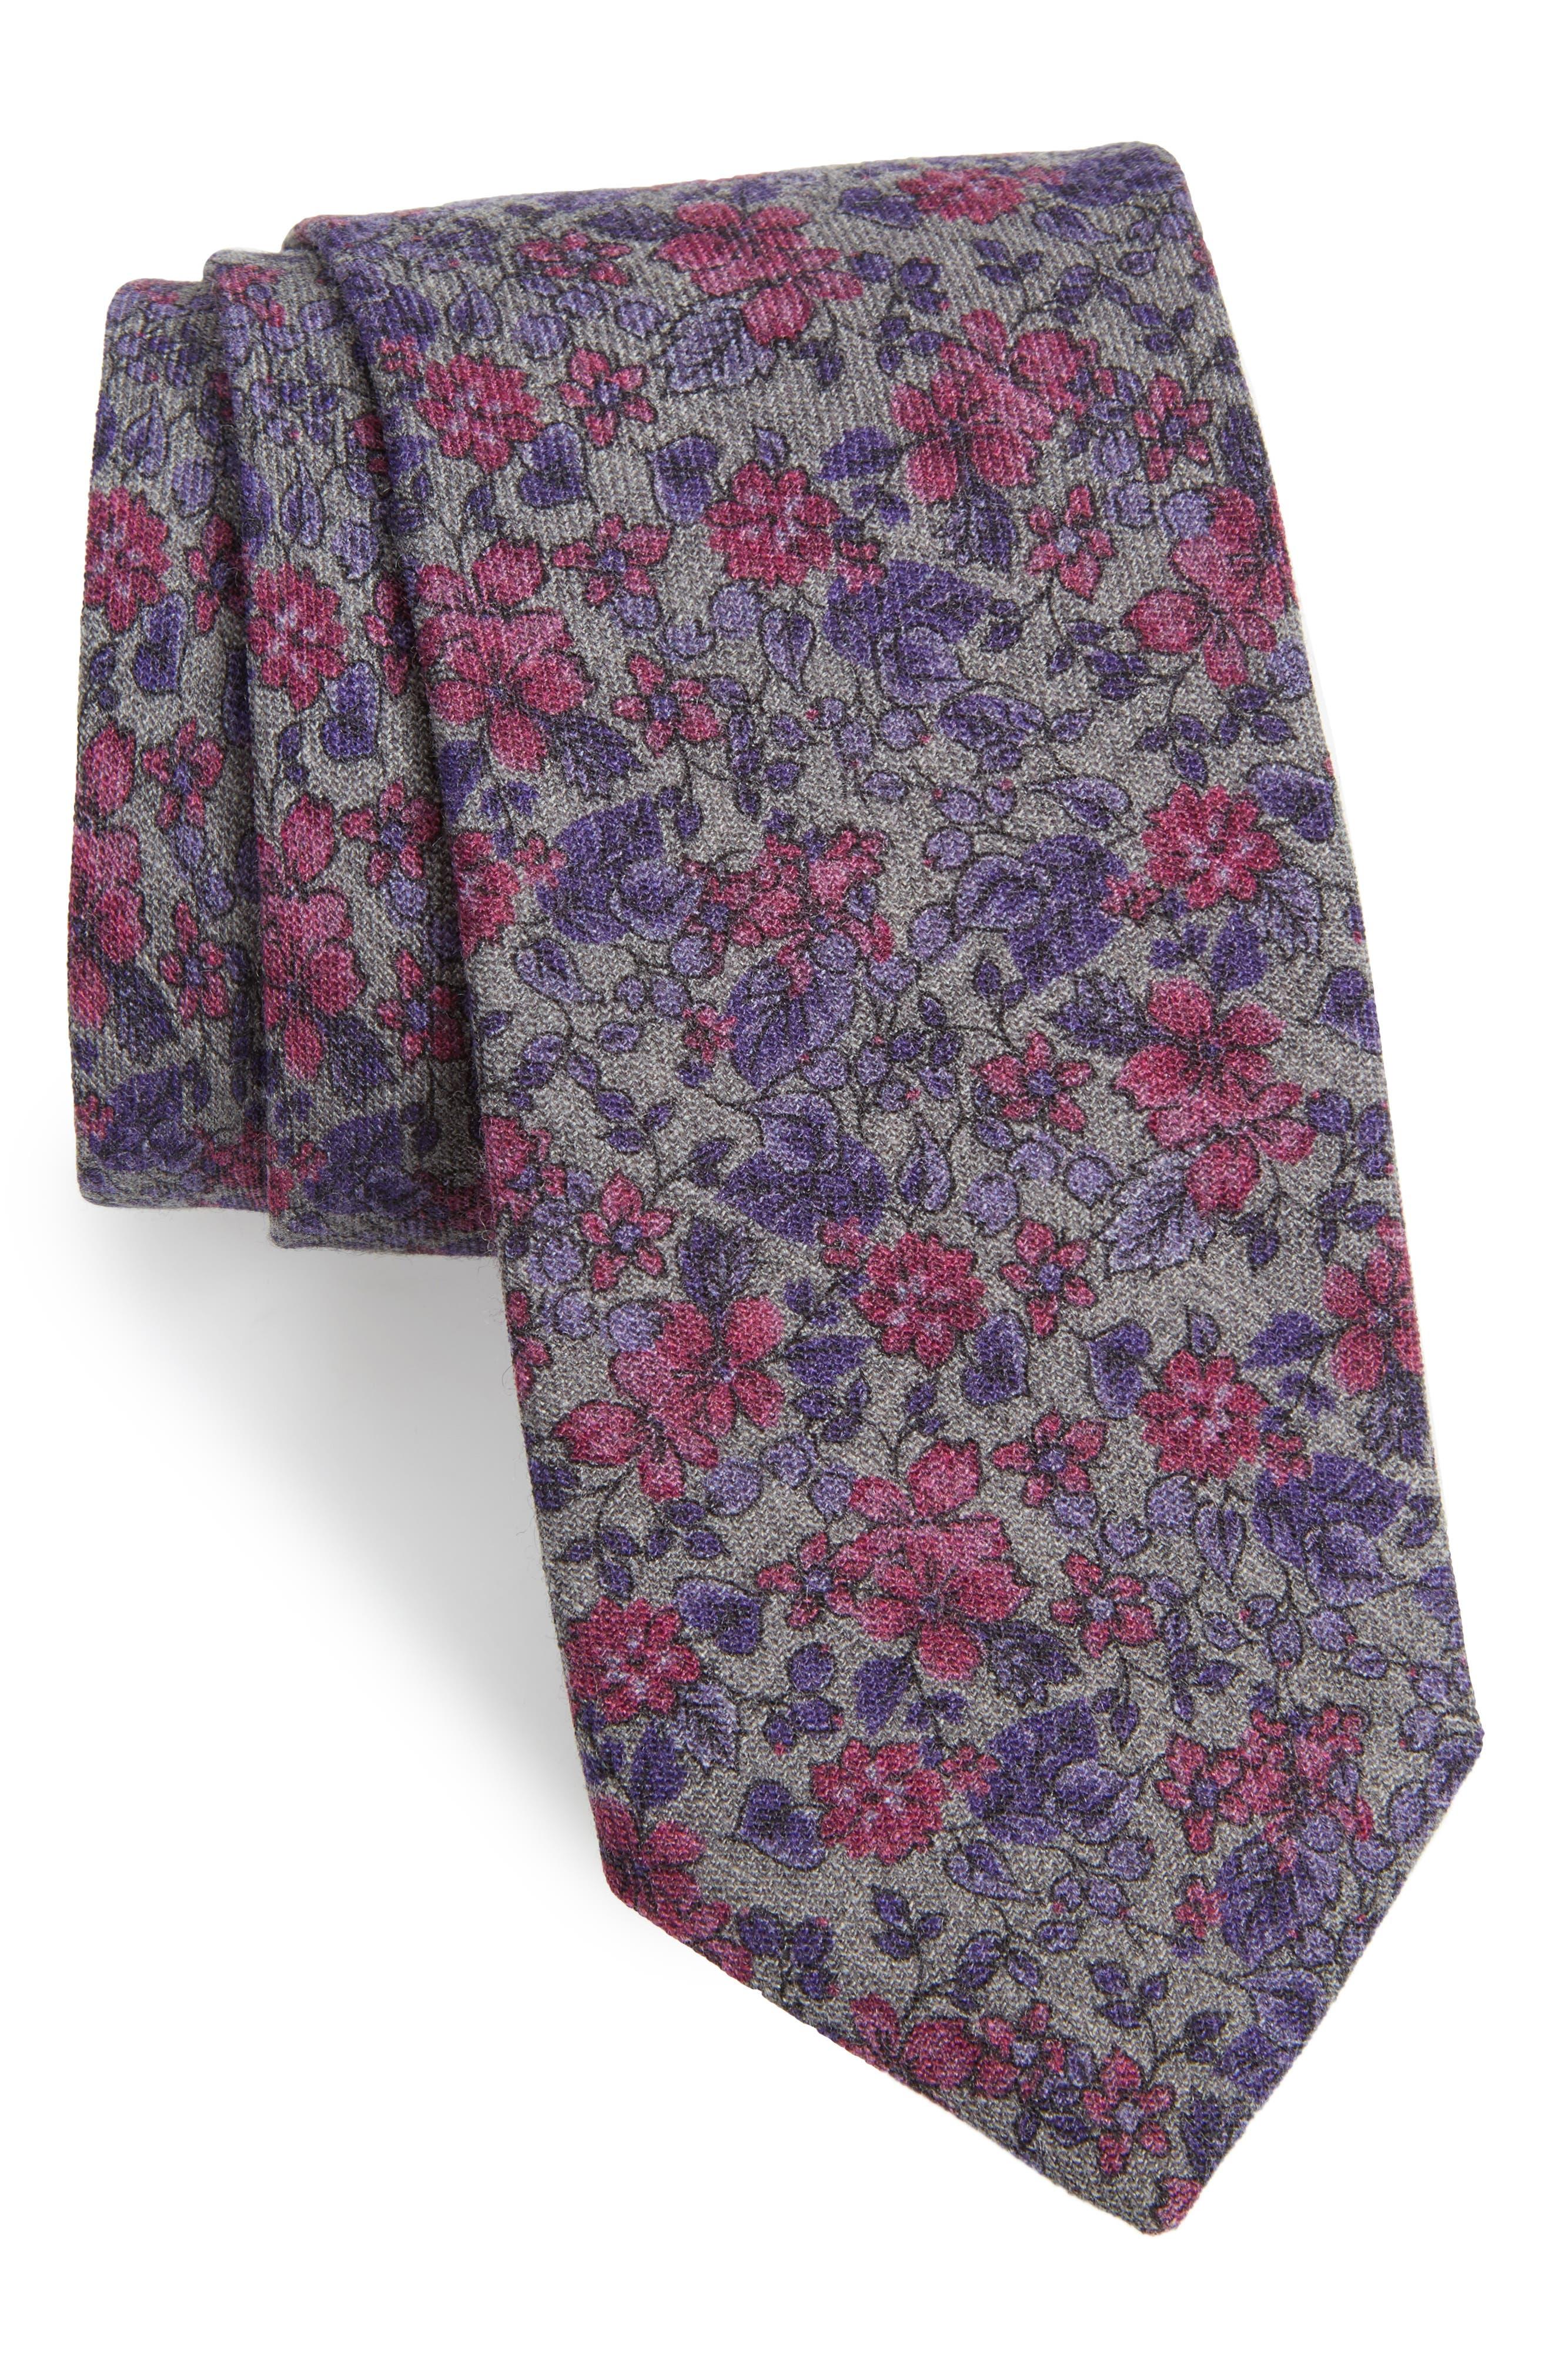 Vine Flower Wool Tie,                             Main thumbnail 1, color,                             020